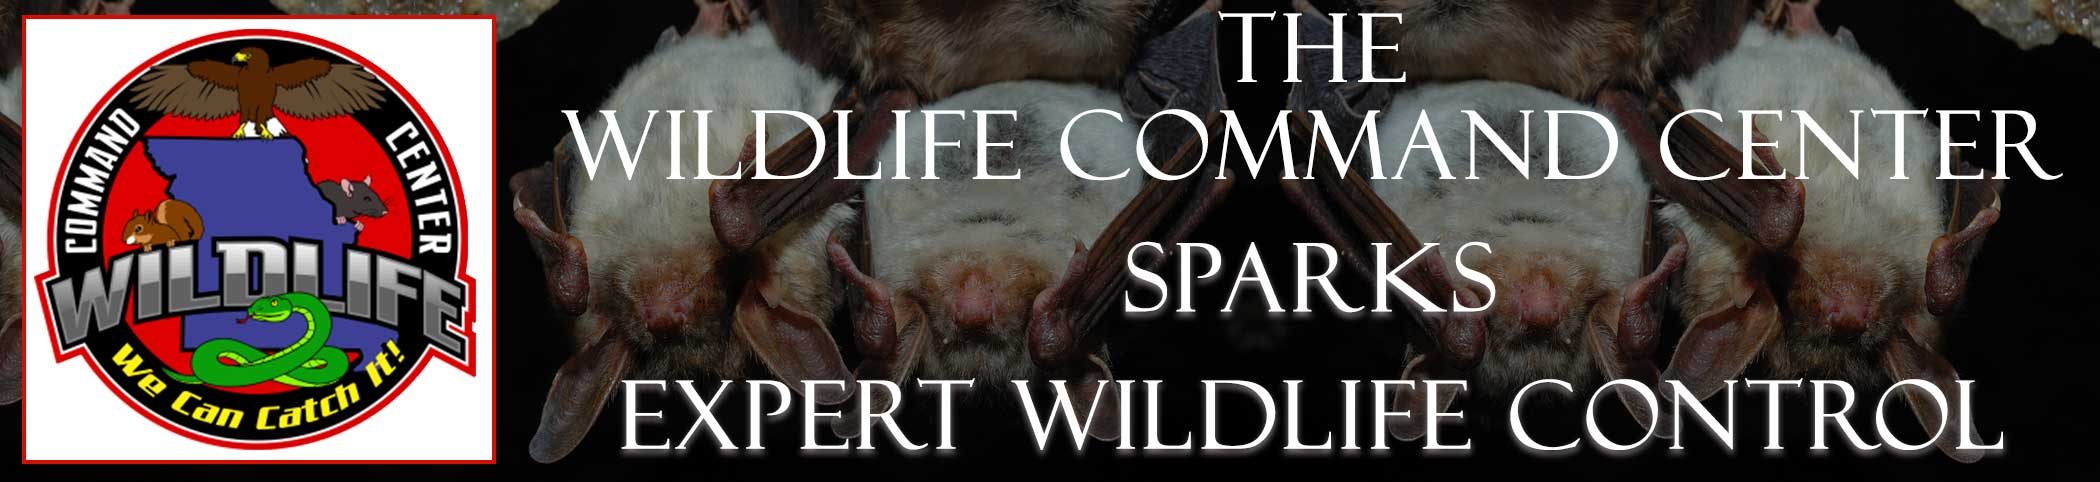 sparks-wildlife-command-center